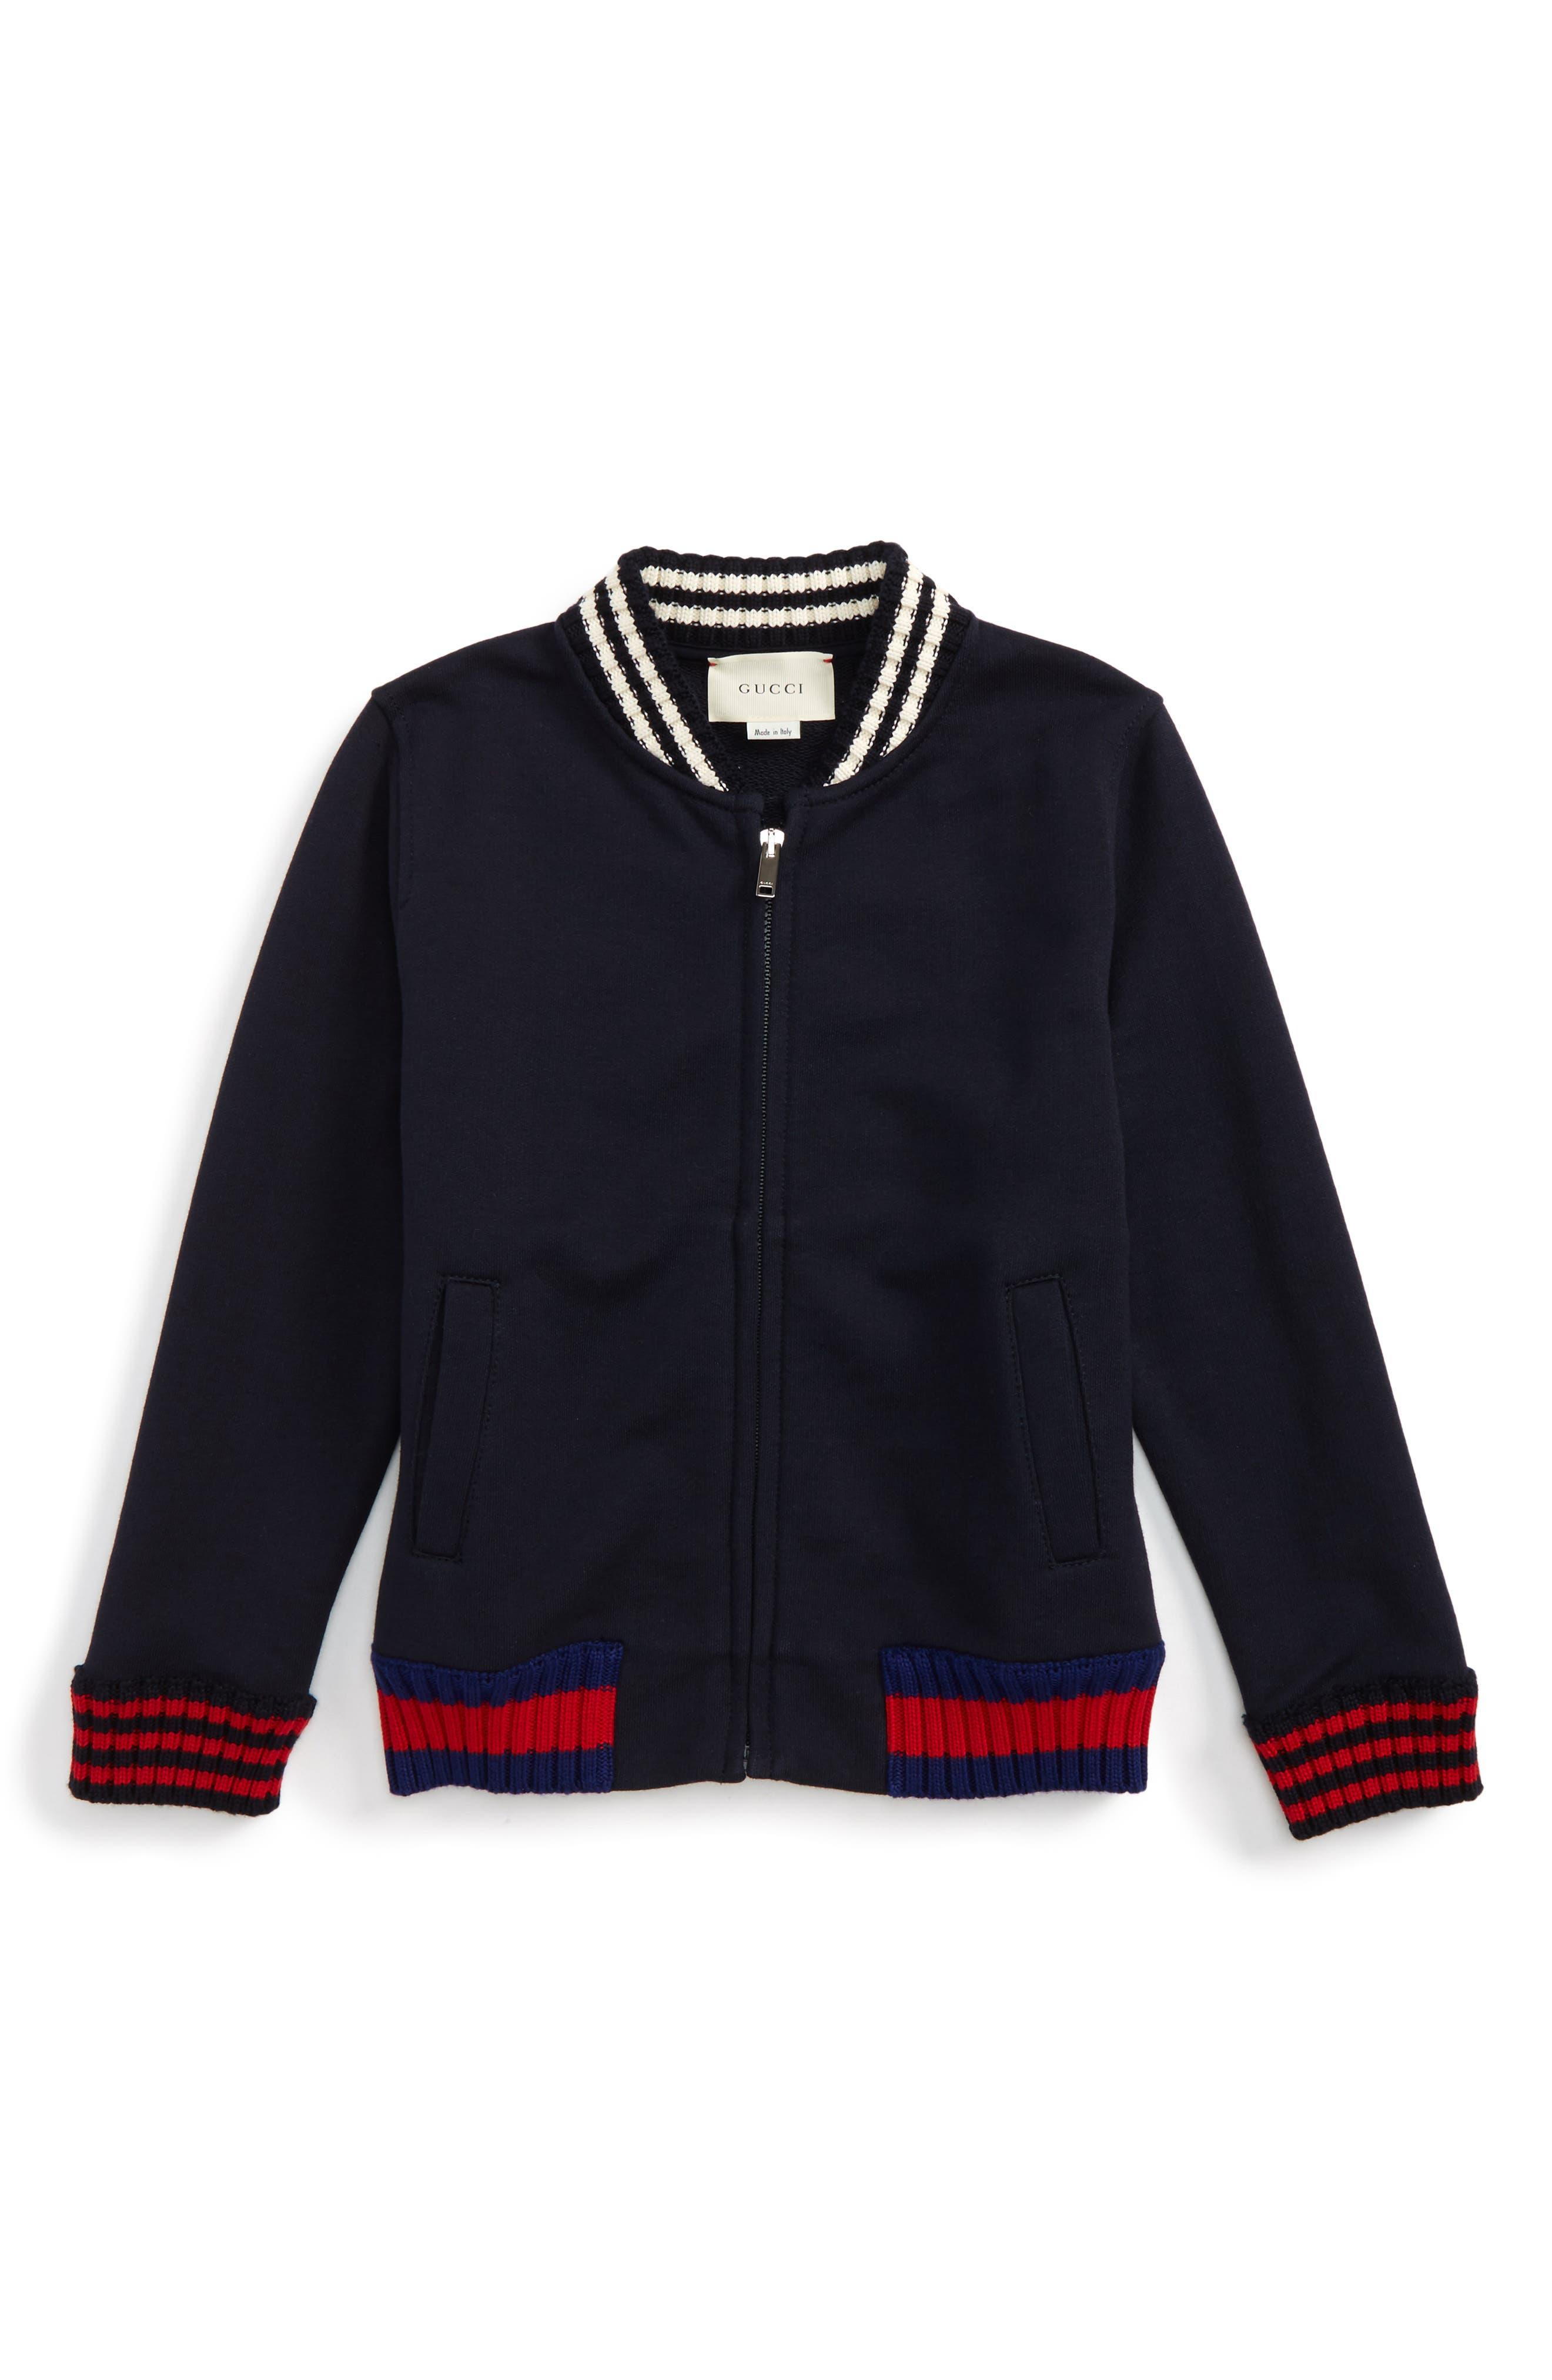 Main Image - Gucci Rib Knit Trim Front Zip Sweatshirt (Little Boys & Big Boys)